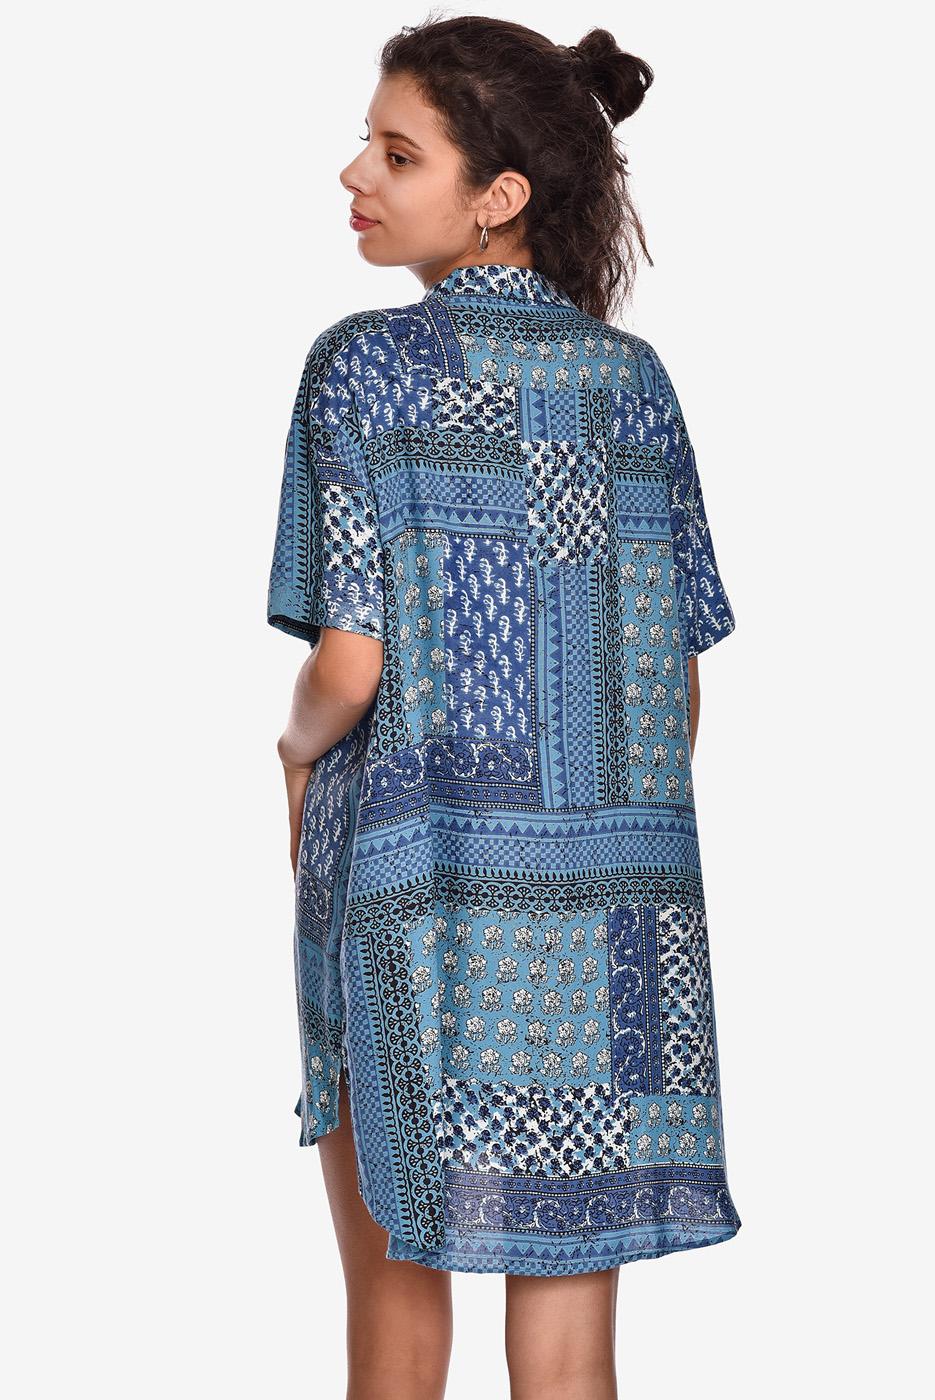 vestido-camisero-estampado-calypso-pachwork-azul